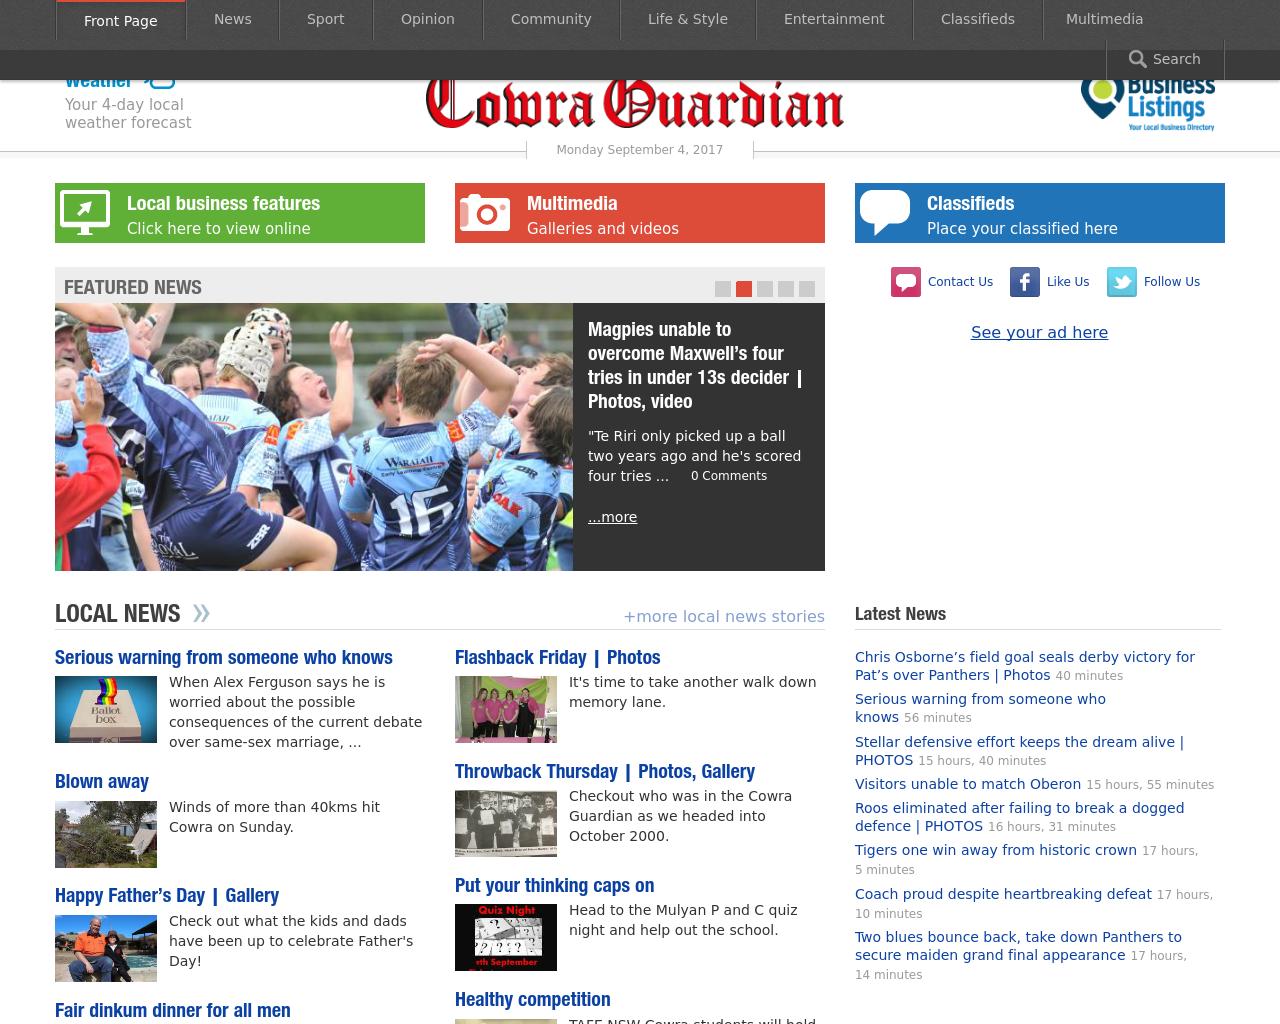 Cowra-Guardian-Advertising-Reviews-Pricing